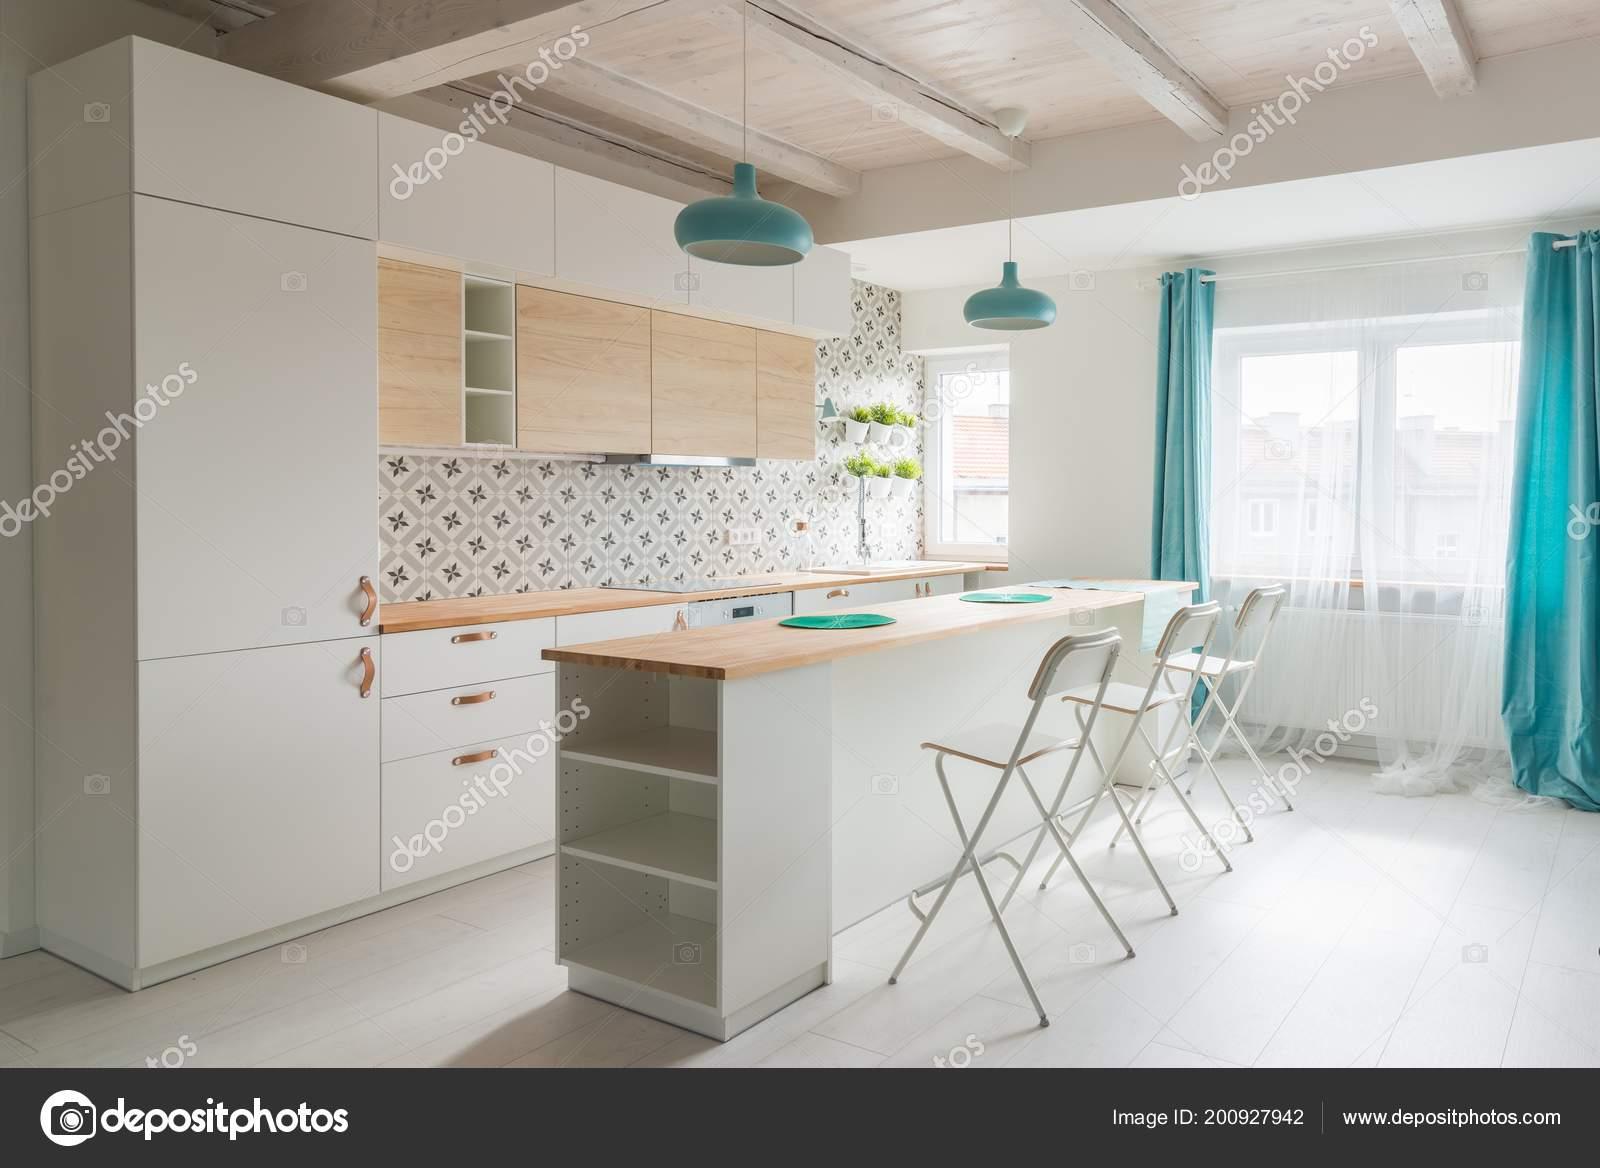 turquoise kitchen decor outdoor kitchens kits 打开明亮的厨房与白色家具岛上的厨房绿松石灯和窗帘现代明亮的阁楼公寓 打开明亮的厨房与白色家具岛上的厨房绿松石灯和窗帘